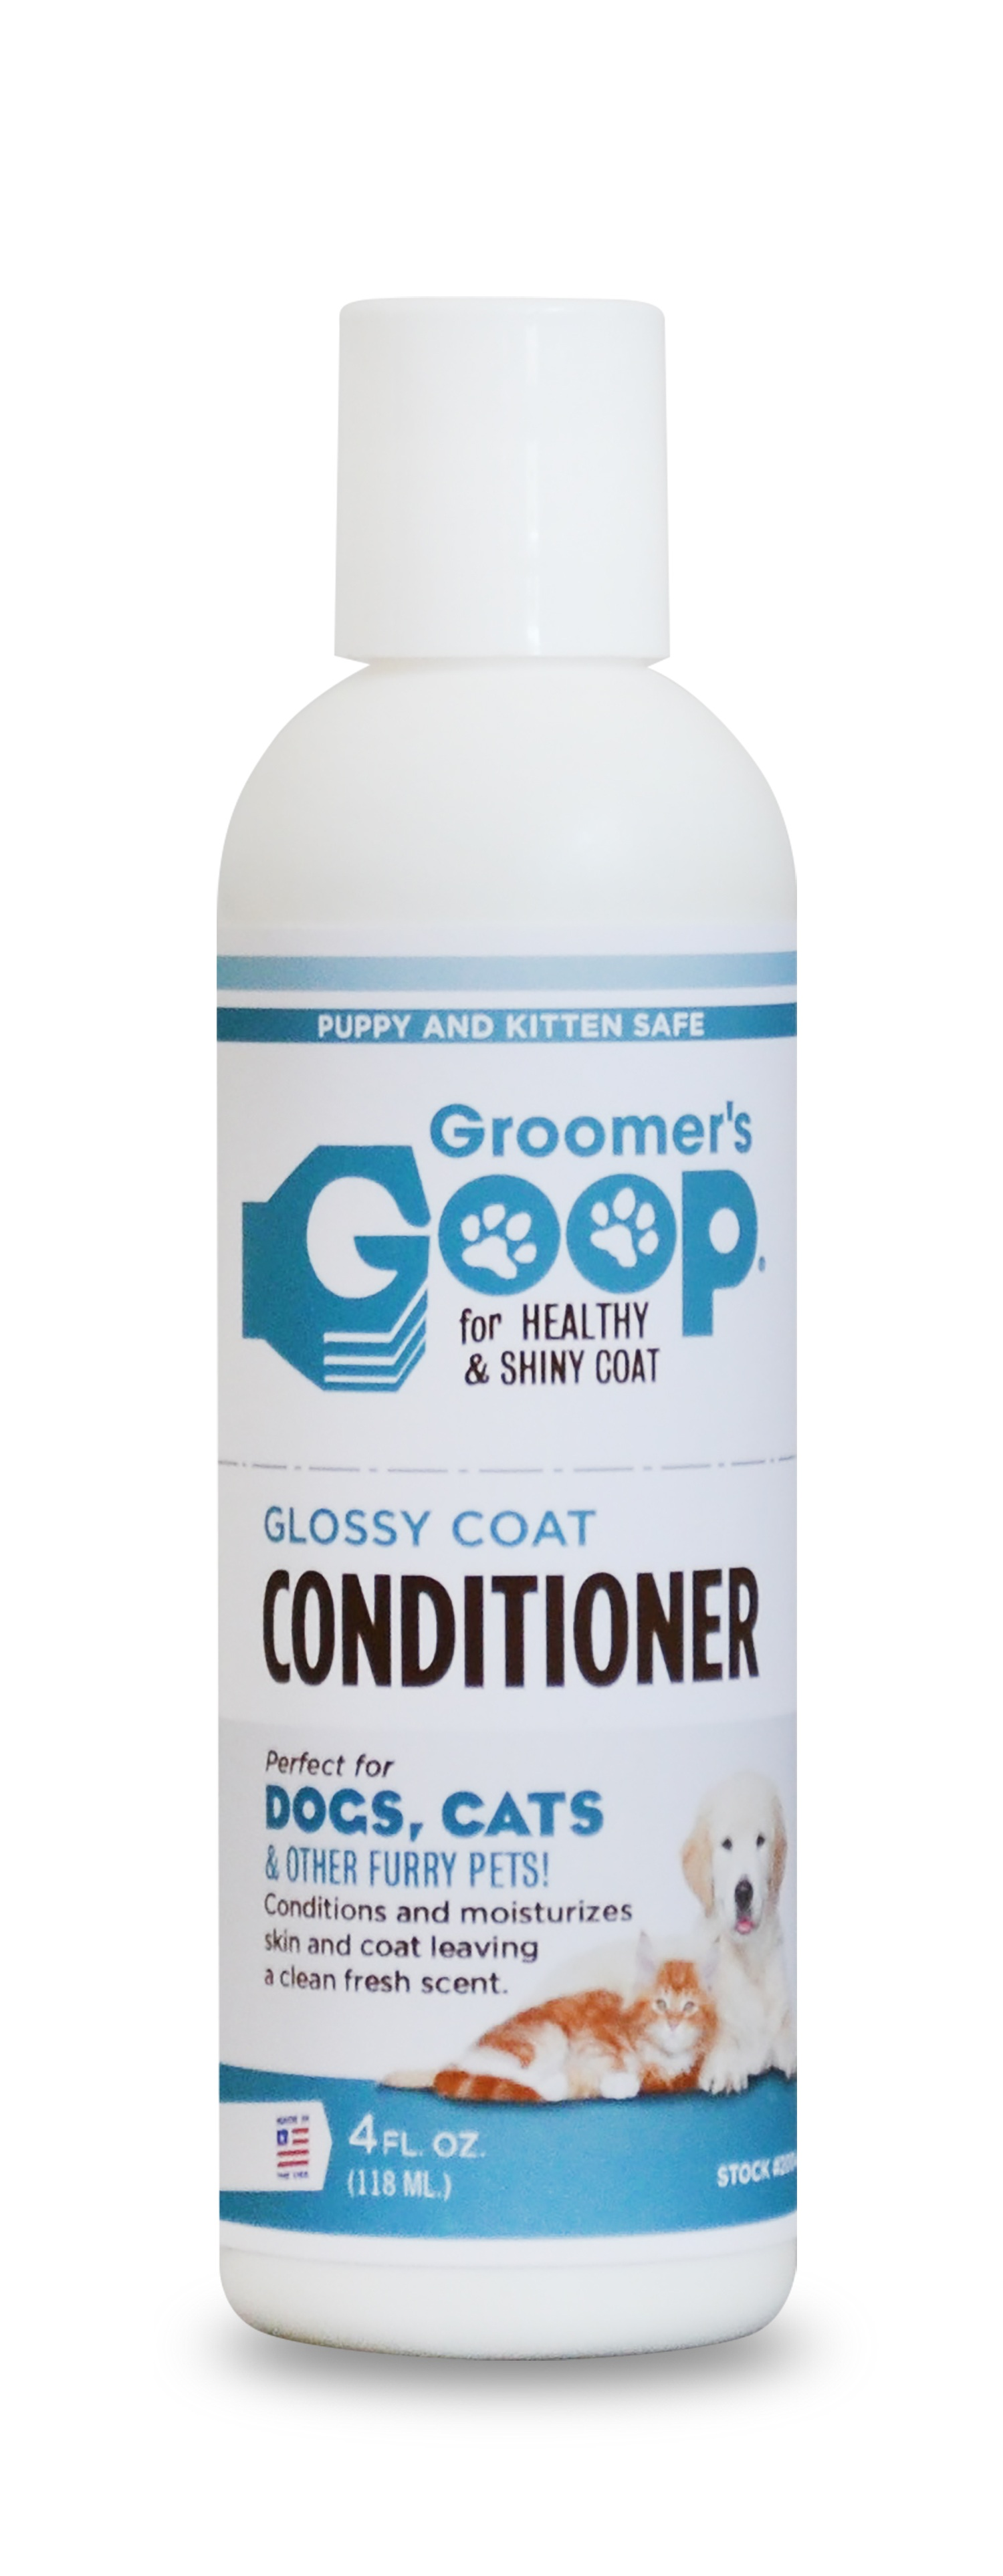 Moms-Goop-Groomers-2004-Conditioner4oz.jpg